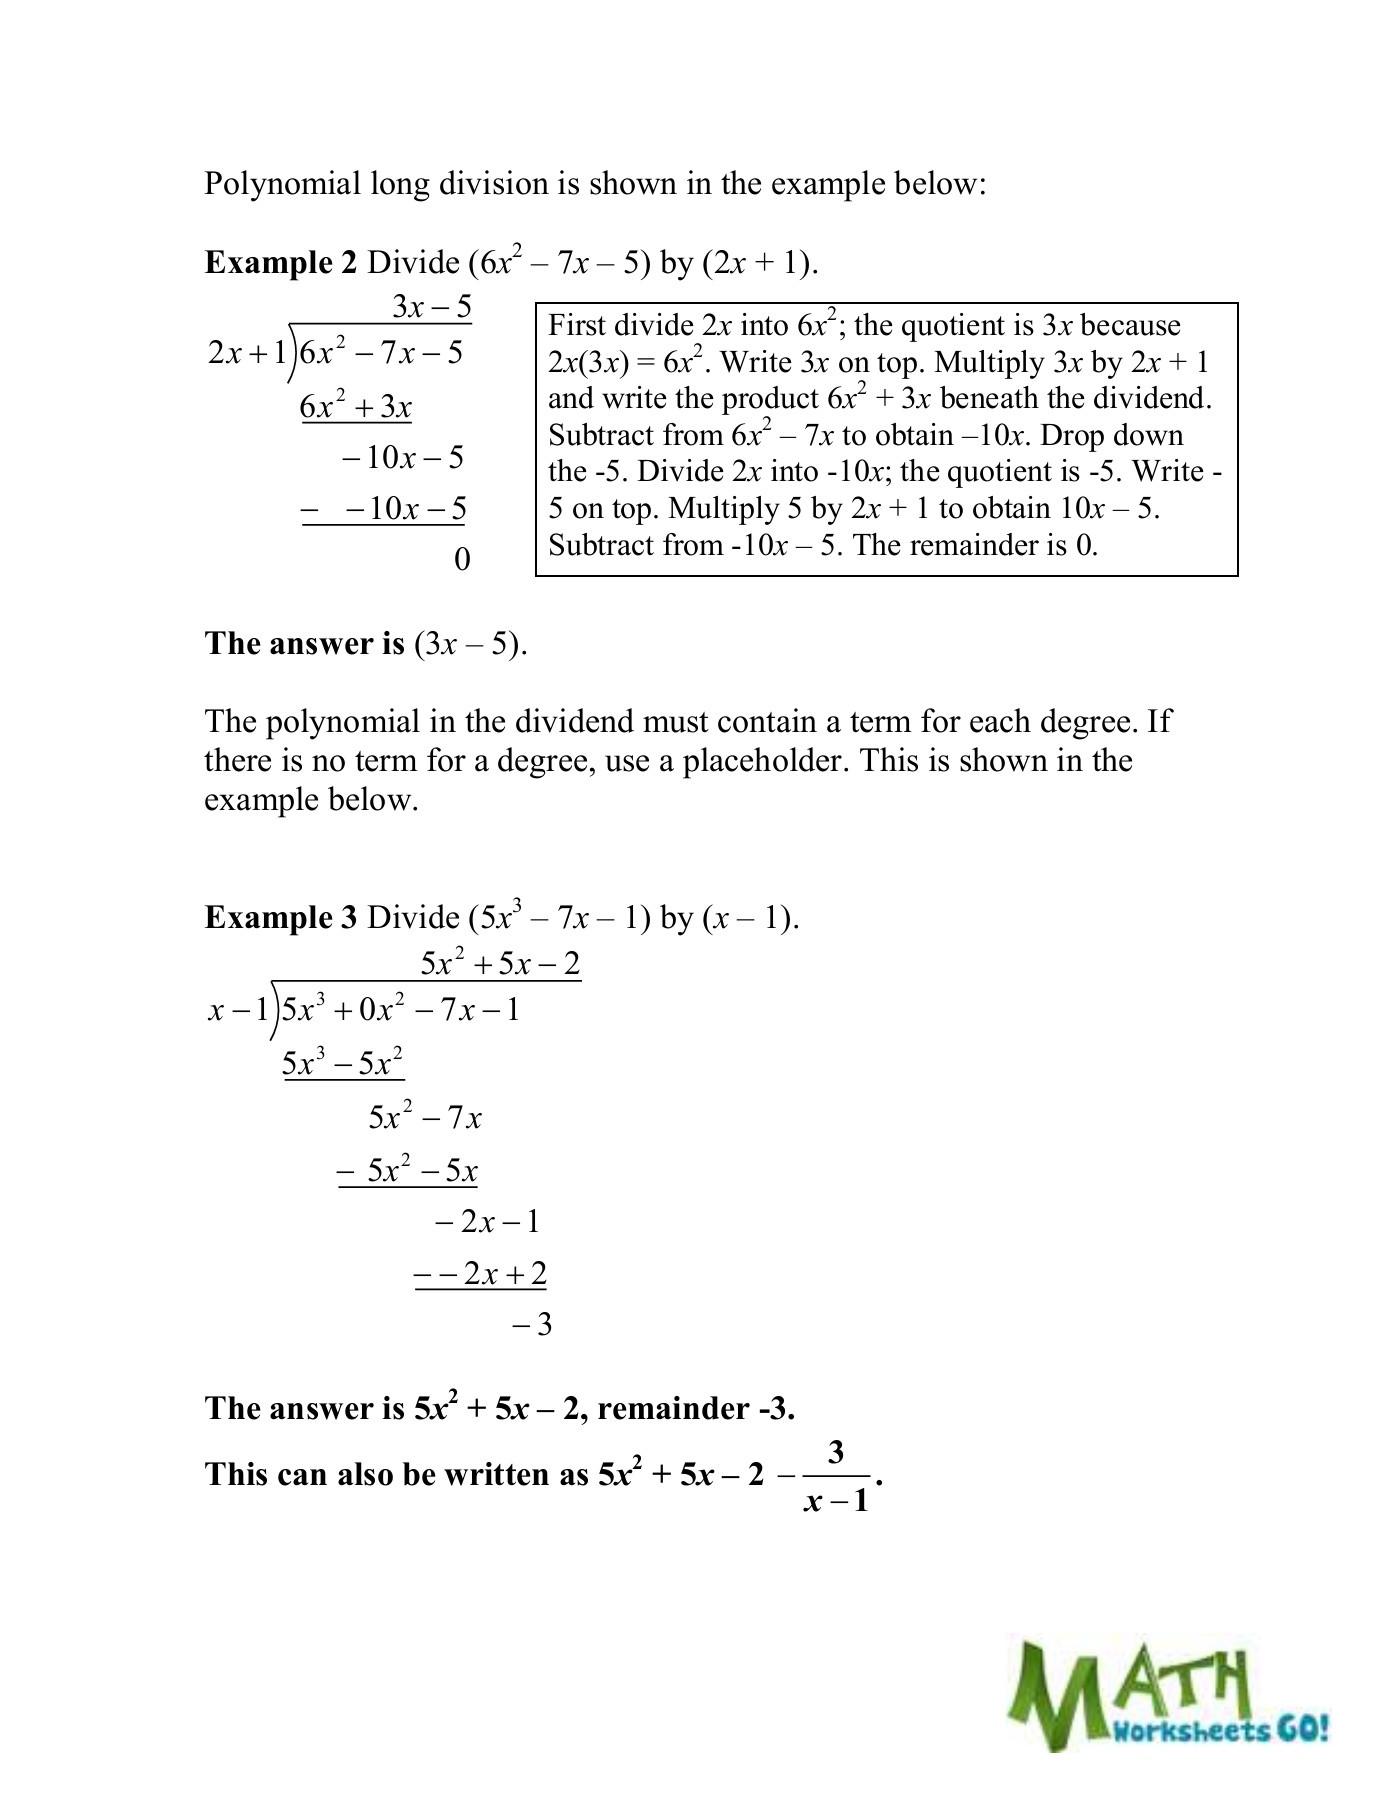 Dividing Polynomials Worksheet Answers Dividing Polynomials Worksheet